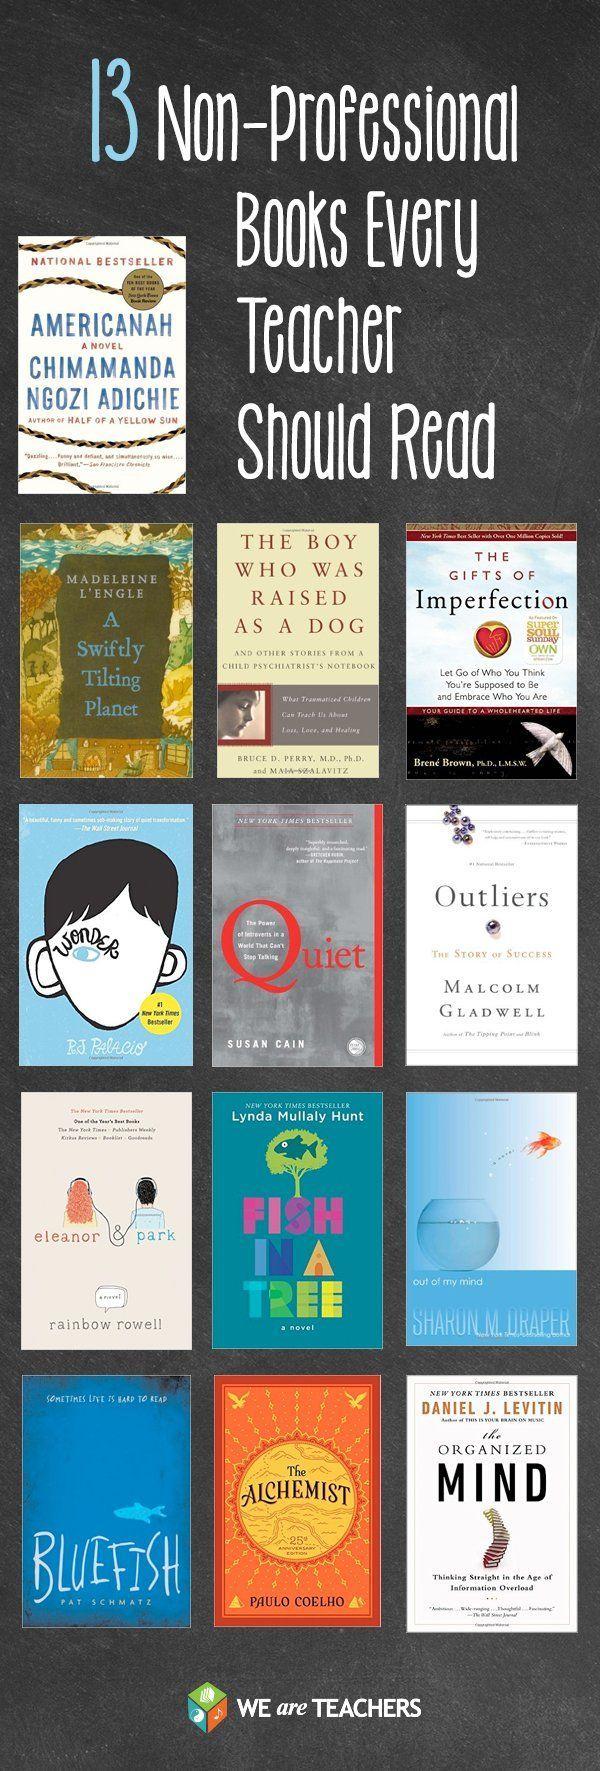 13 non-professional books every teacher should read.